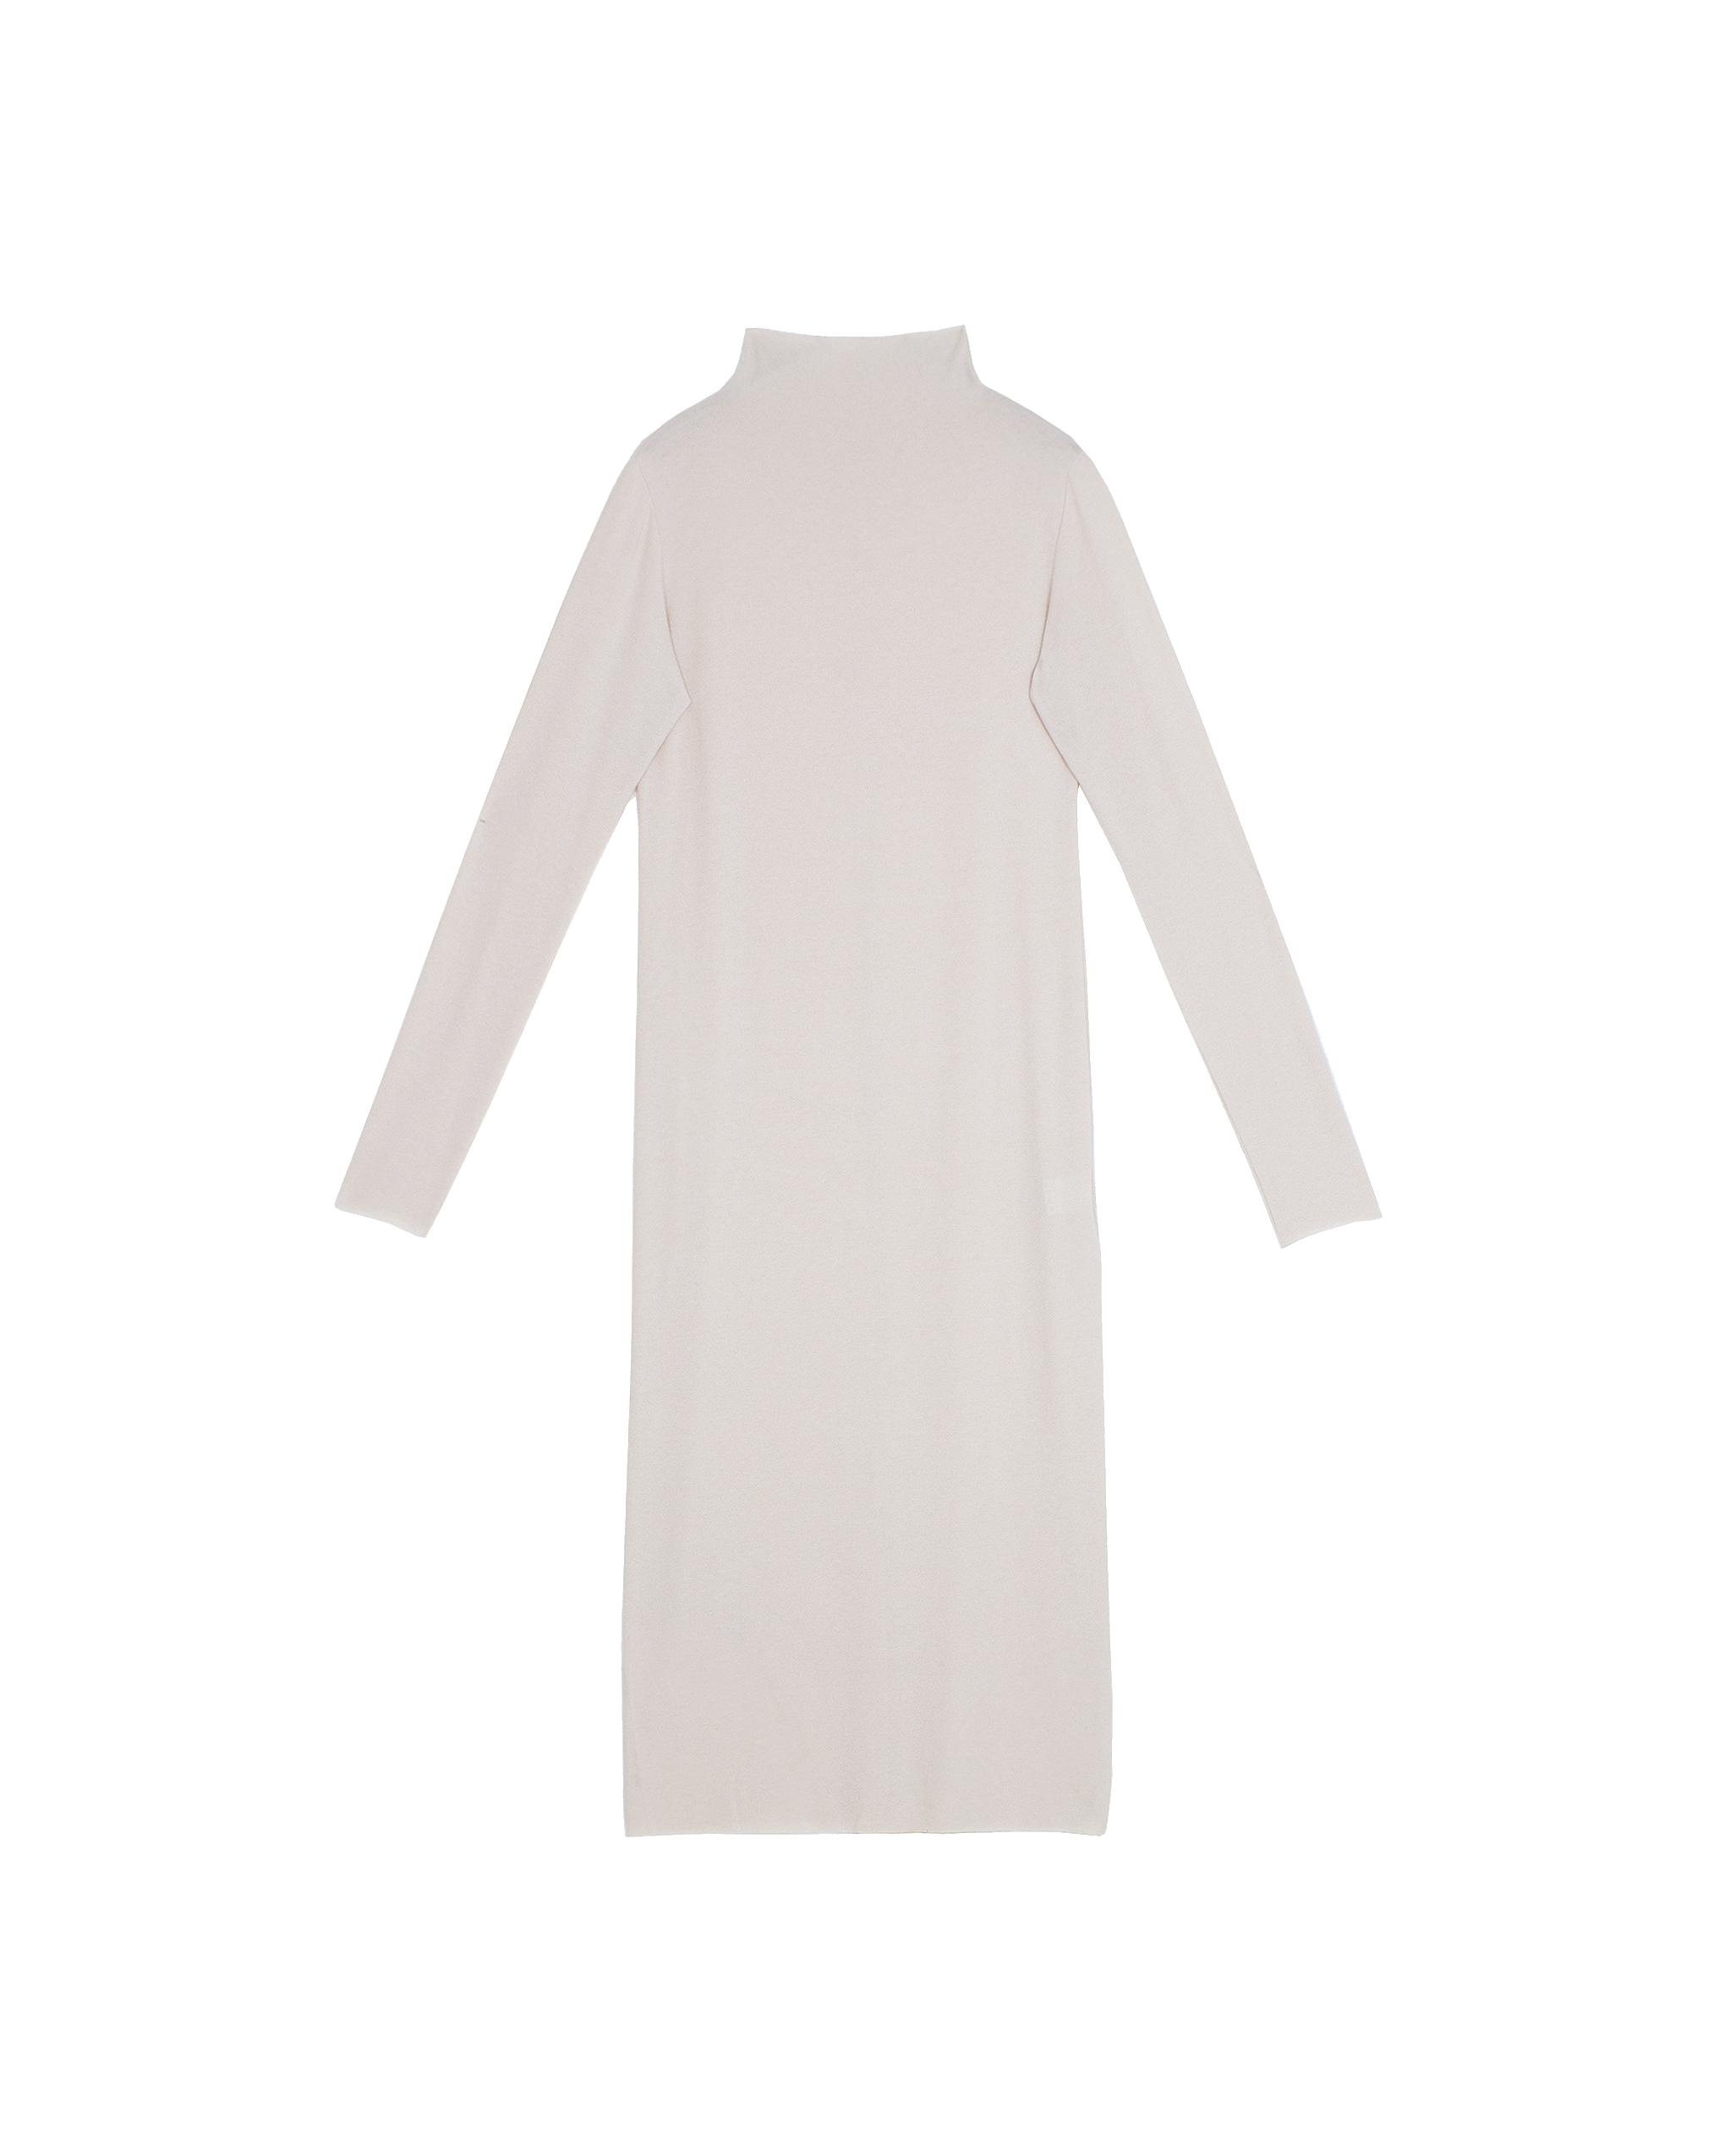 EMIN + PAUL cream second skin jersey dress.